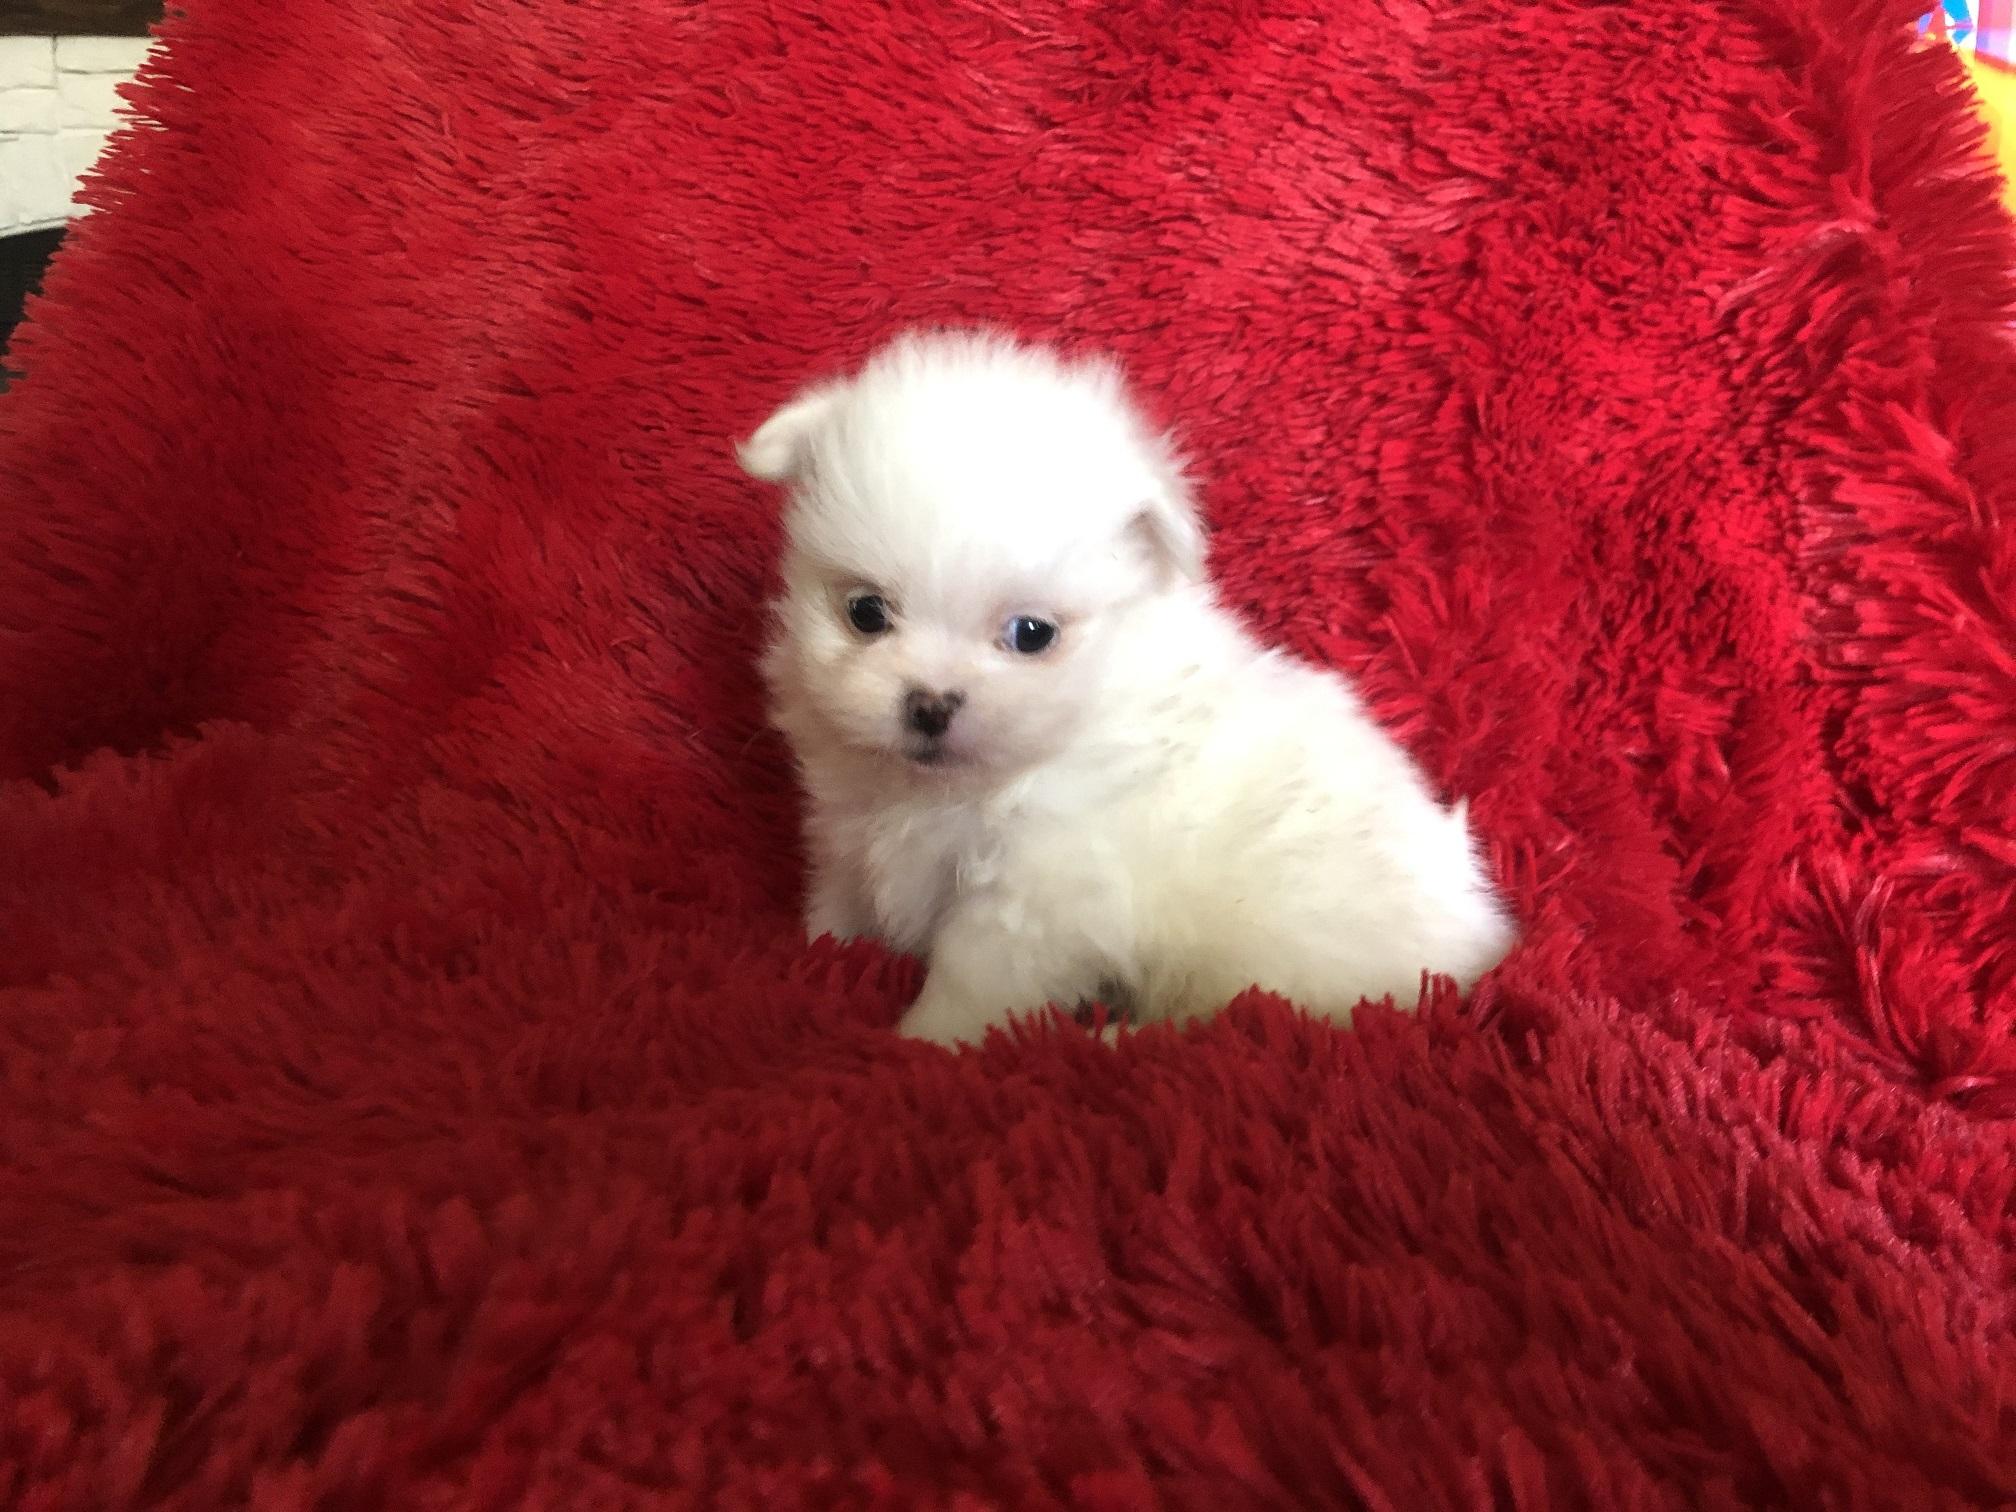 Pomeranian/Shih Tzu puppies